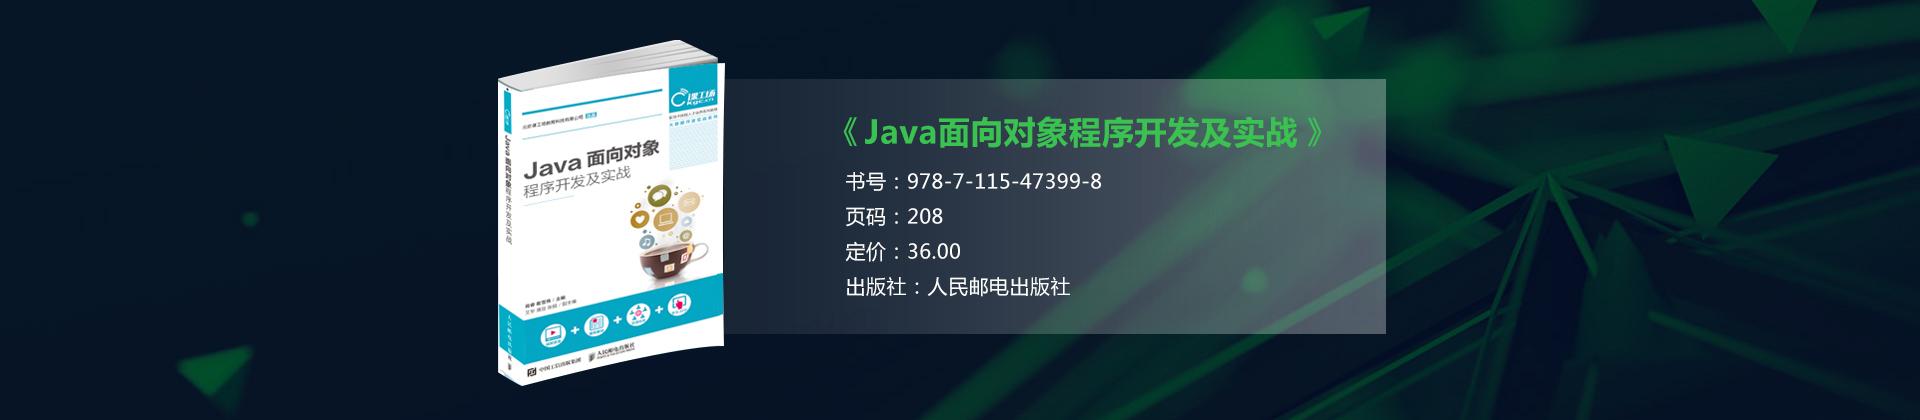 Java面向對象程序開發及實戰